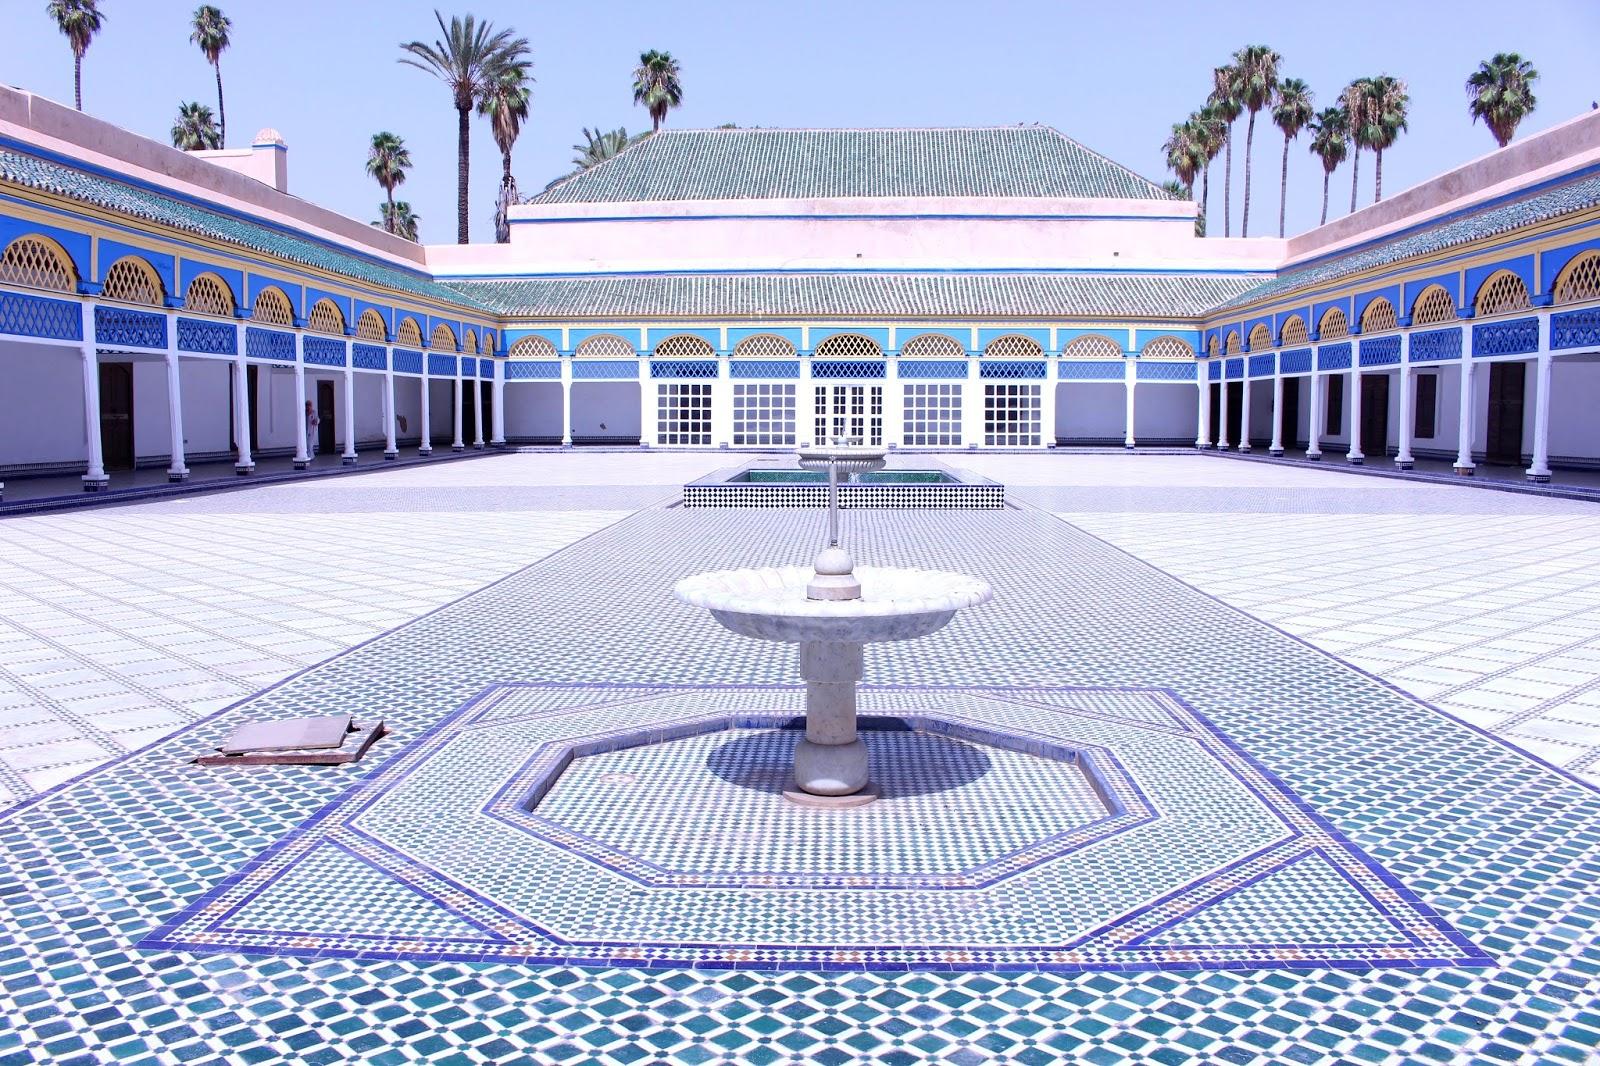 Visite Marrakech